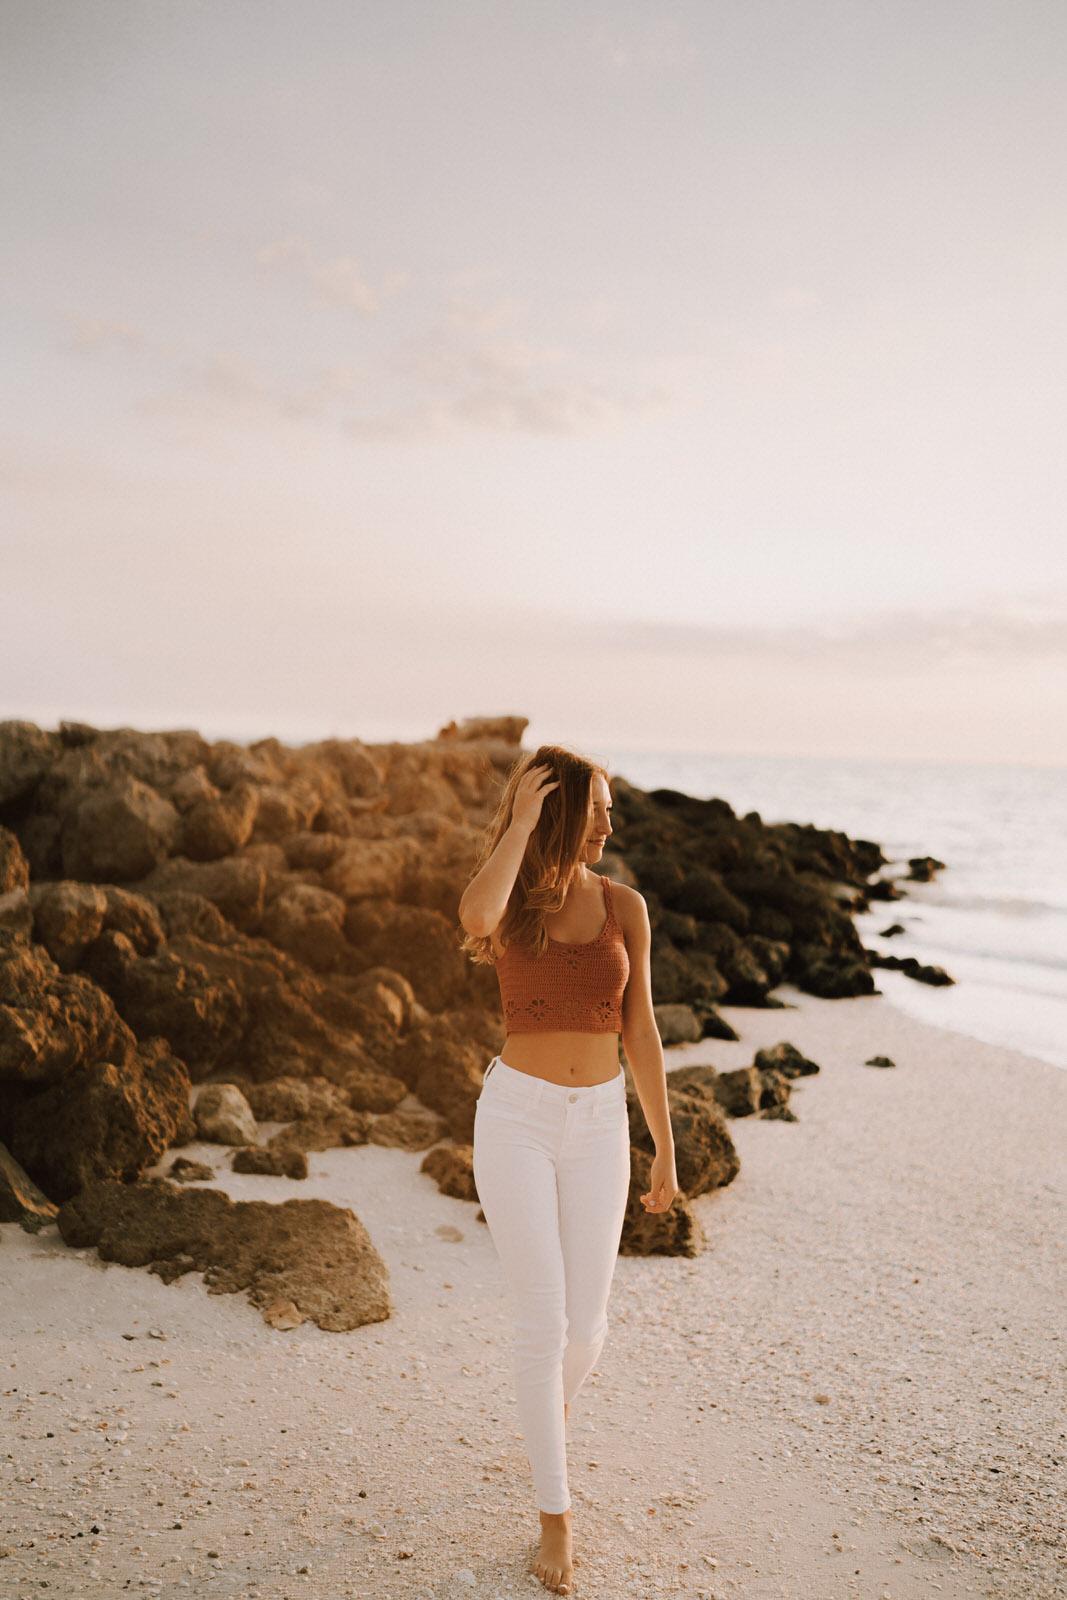 Fort Myers Senior Photos on Bonita Beach - Michelle Gonzalez Photography - Sammie-113.JPG